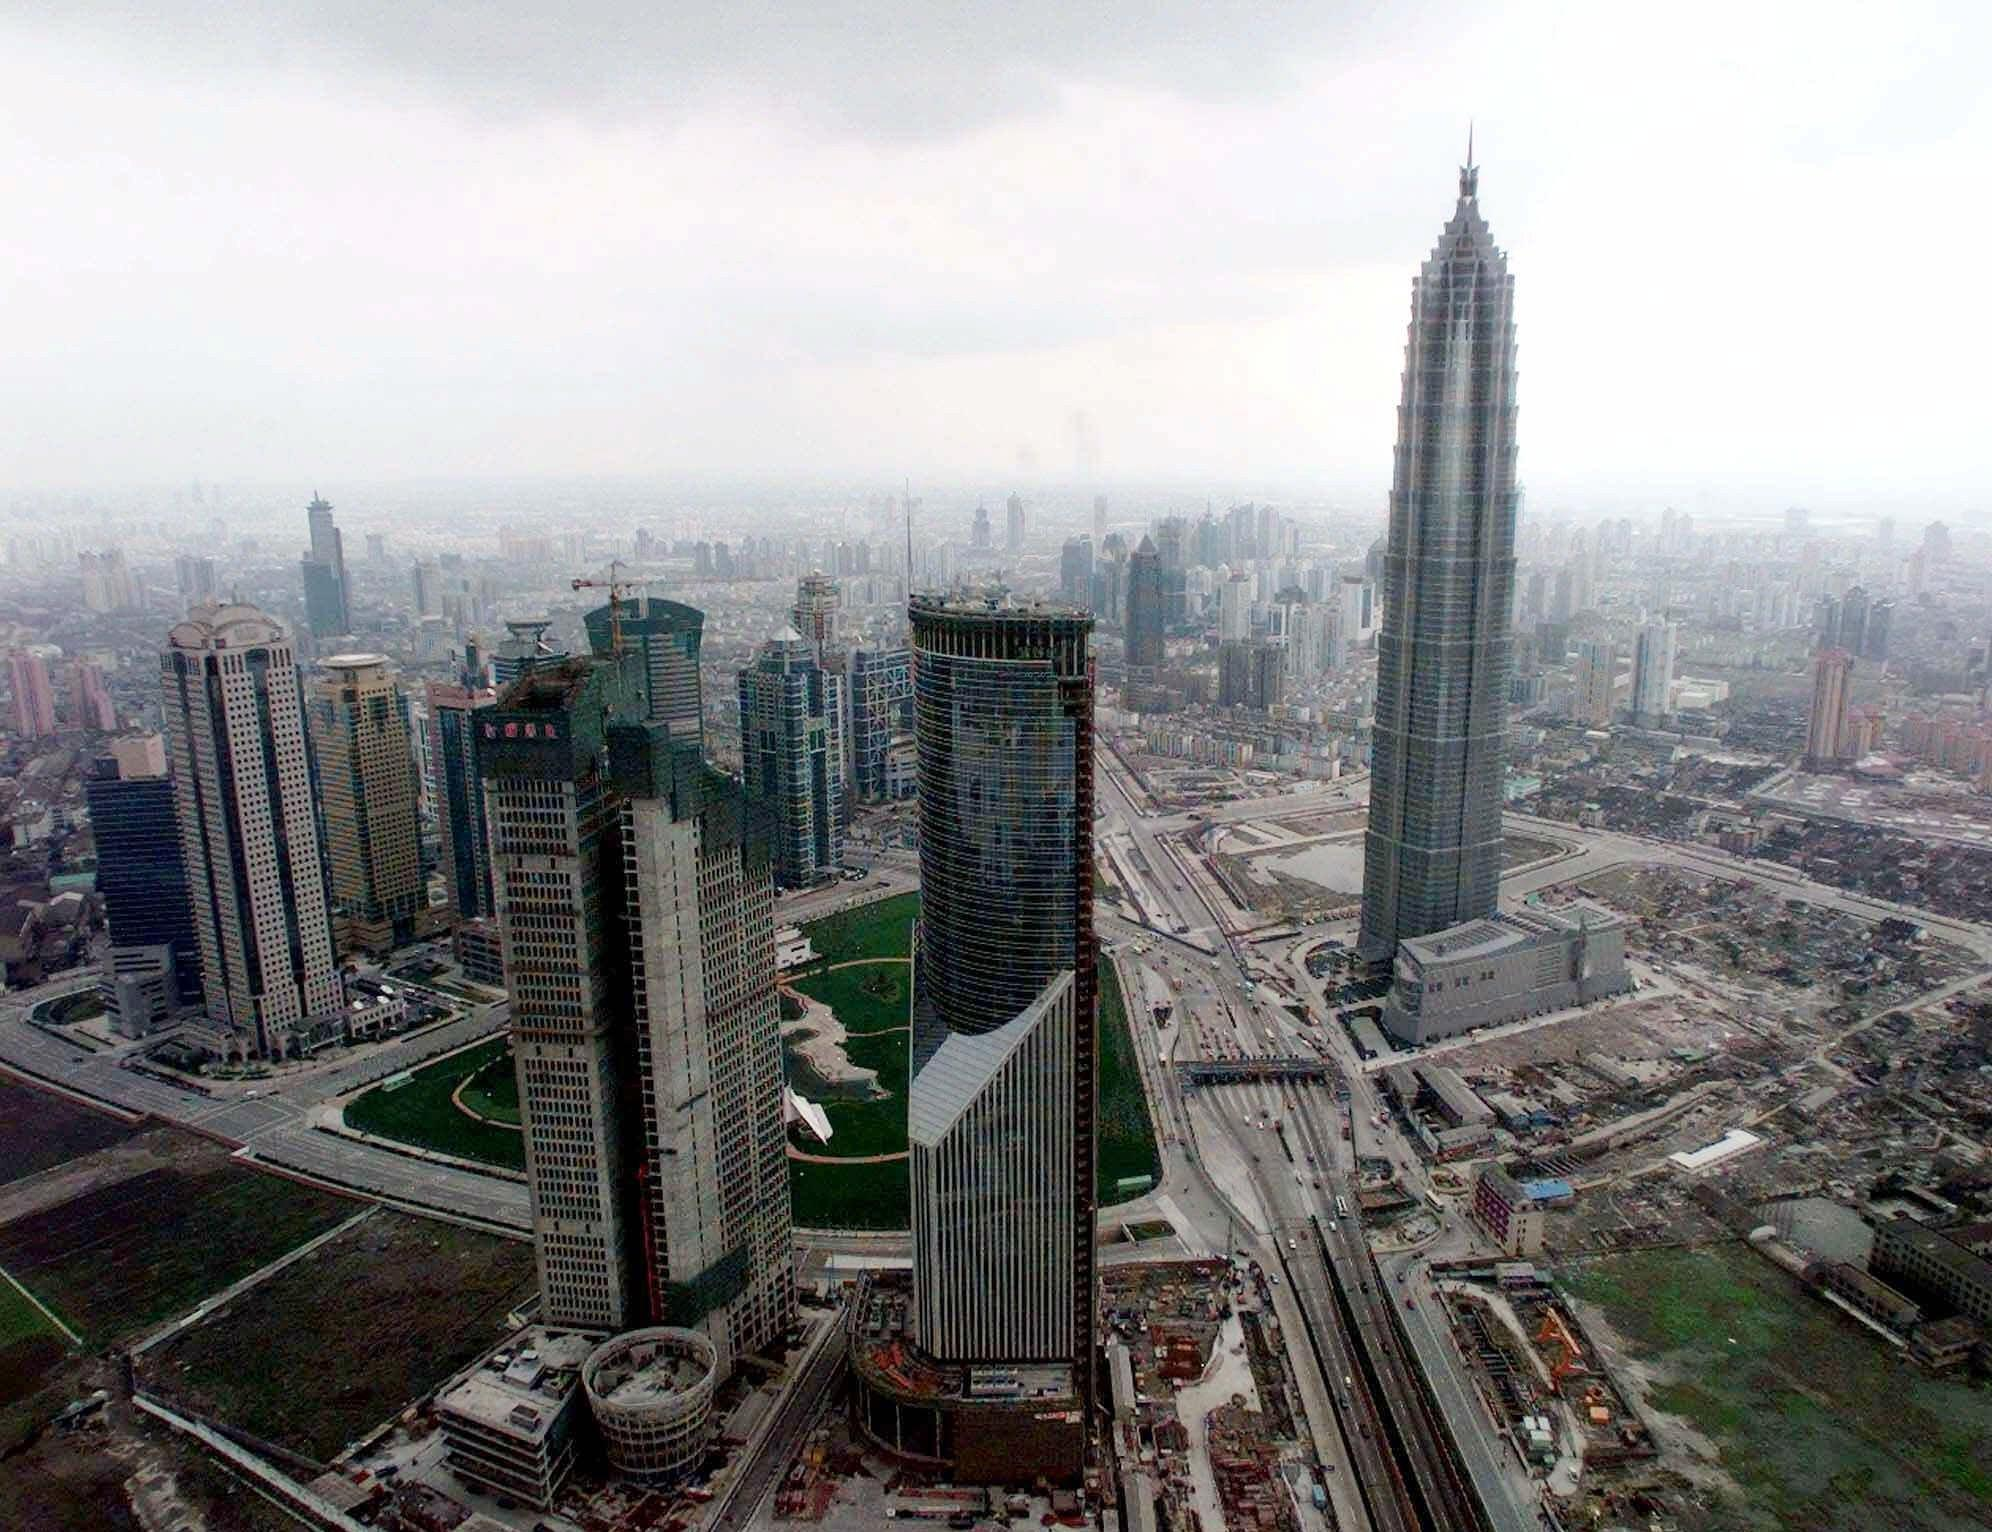 Hyatt CFO: Business is stable in China despite the trade war